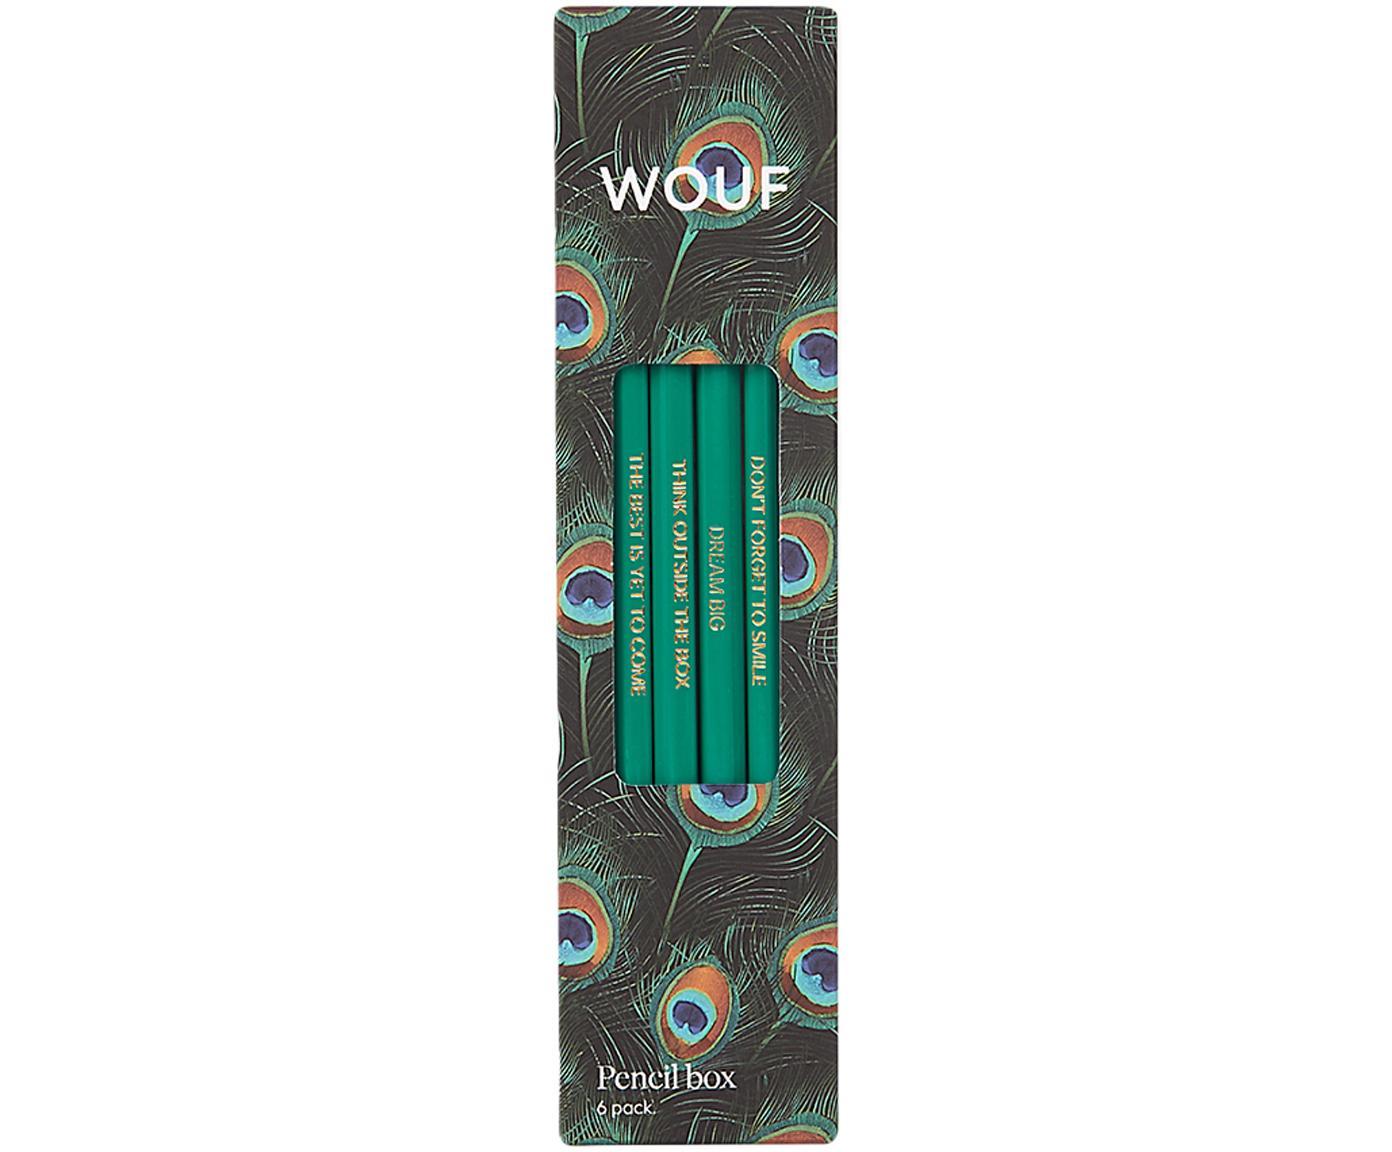 Bleistift-Set Peacock, 6-tlg., Holz, Schwarz, Mehrfarbig, Grün, 18 x 5 cm